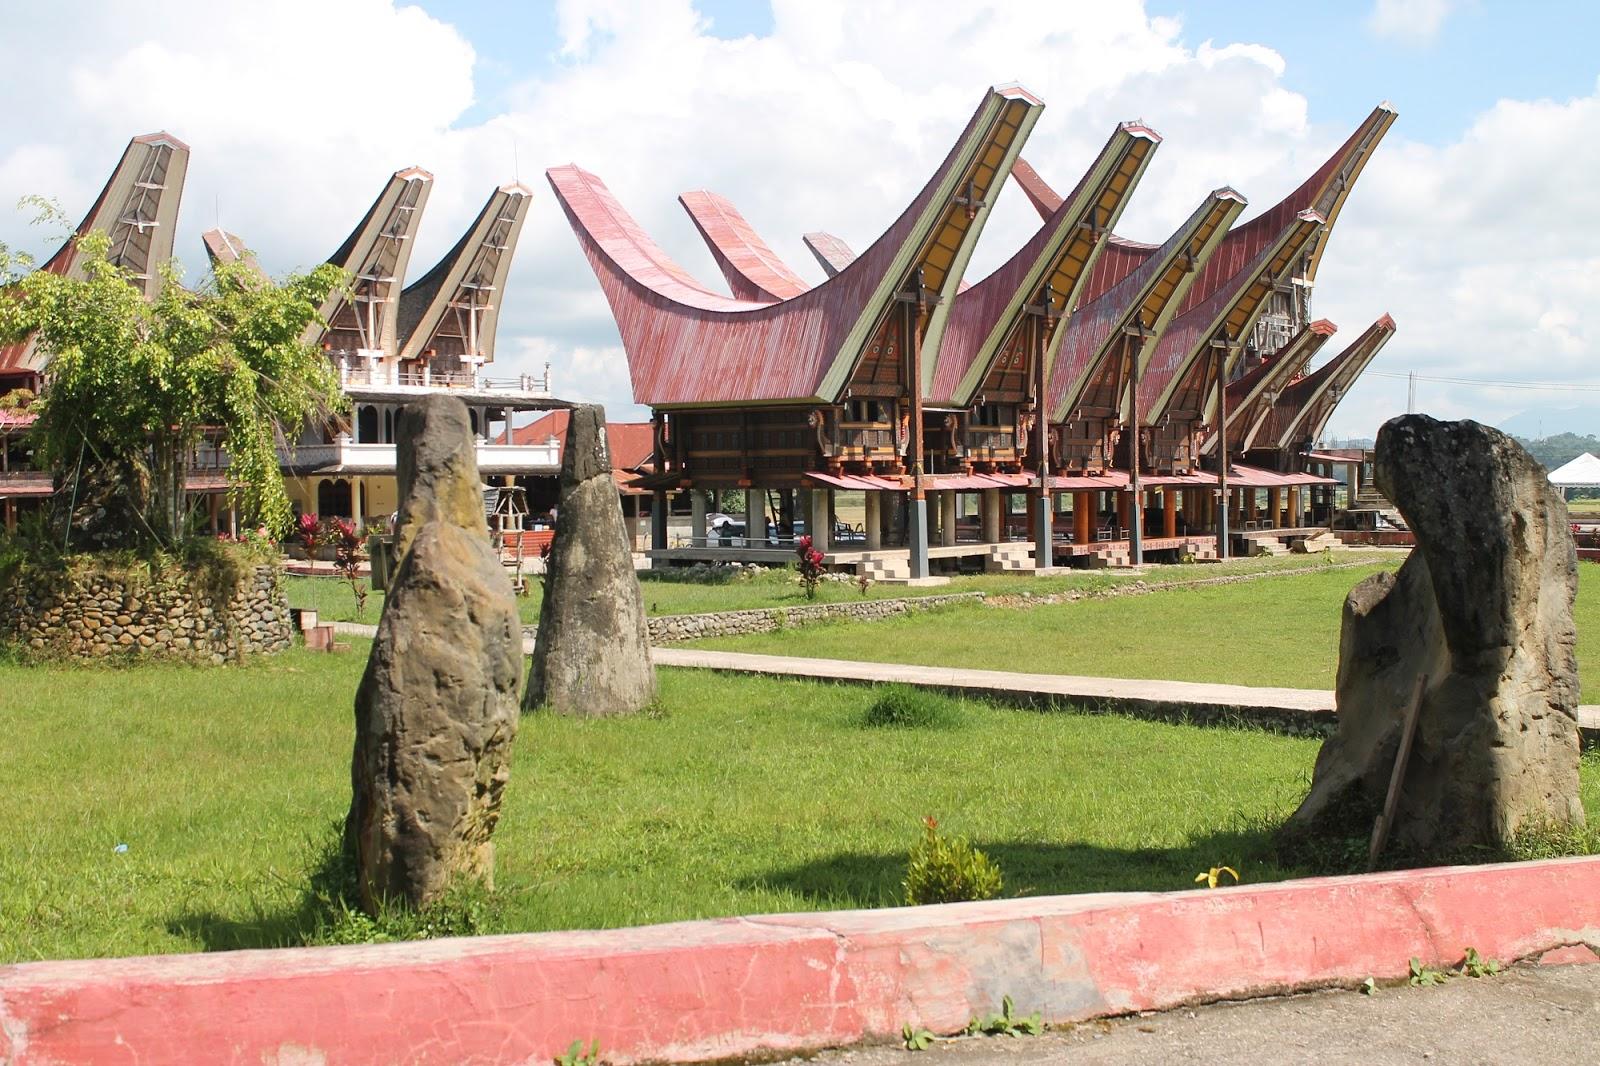 Keunikan Rumah Adat Sulawesi Selatan Tongkonan Rumah Adat Di Indonesia Maynimerry